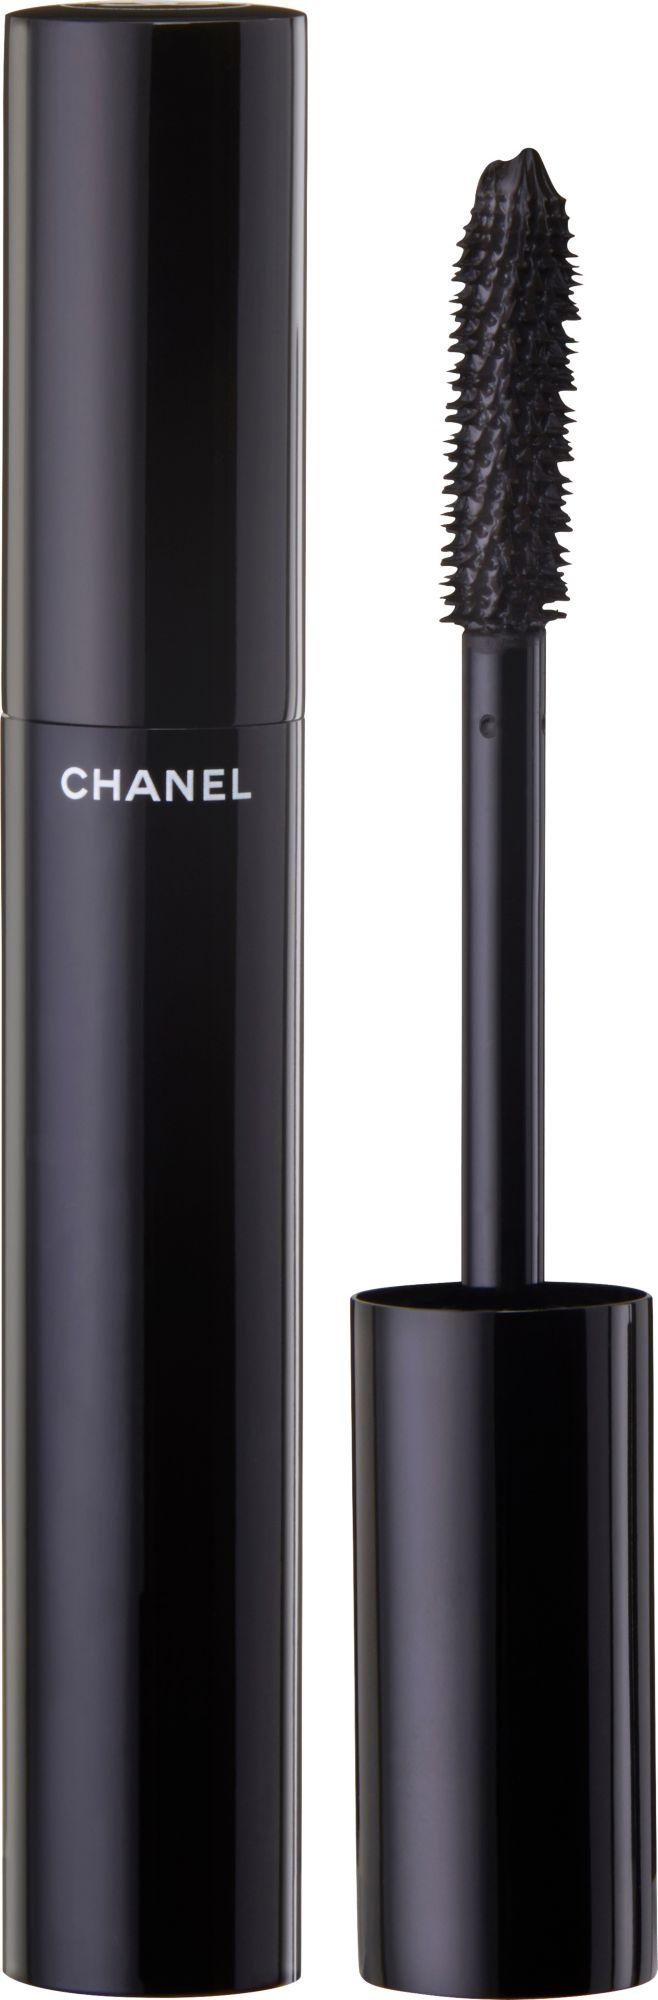 CHANEL Chanel, »Le Volume de Chanel«, Mascara